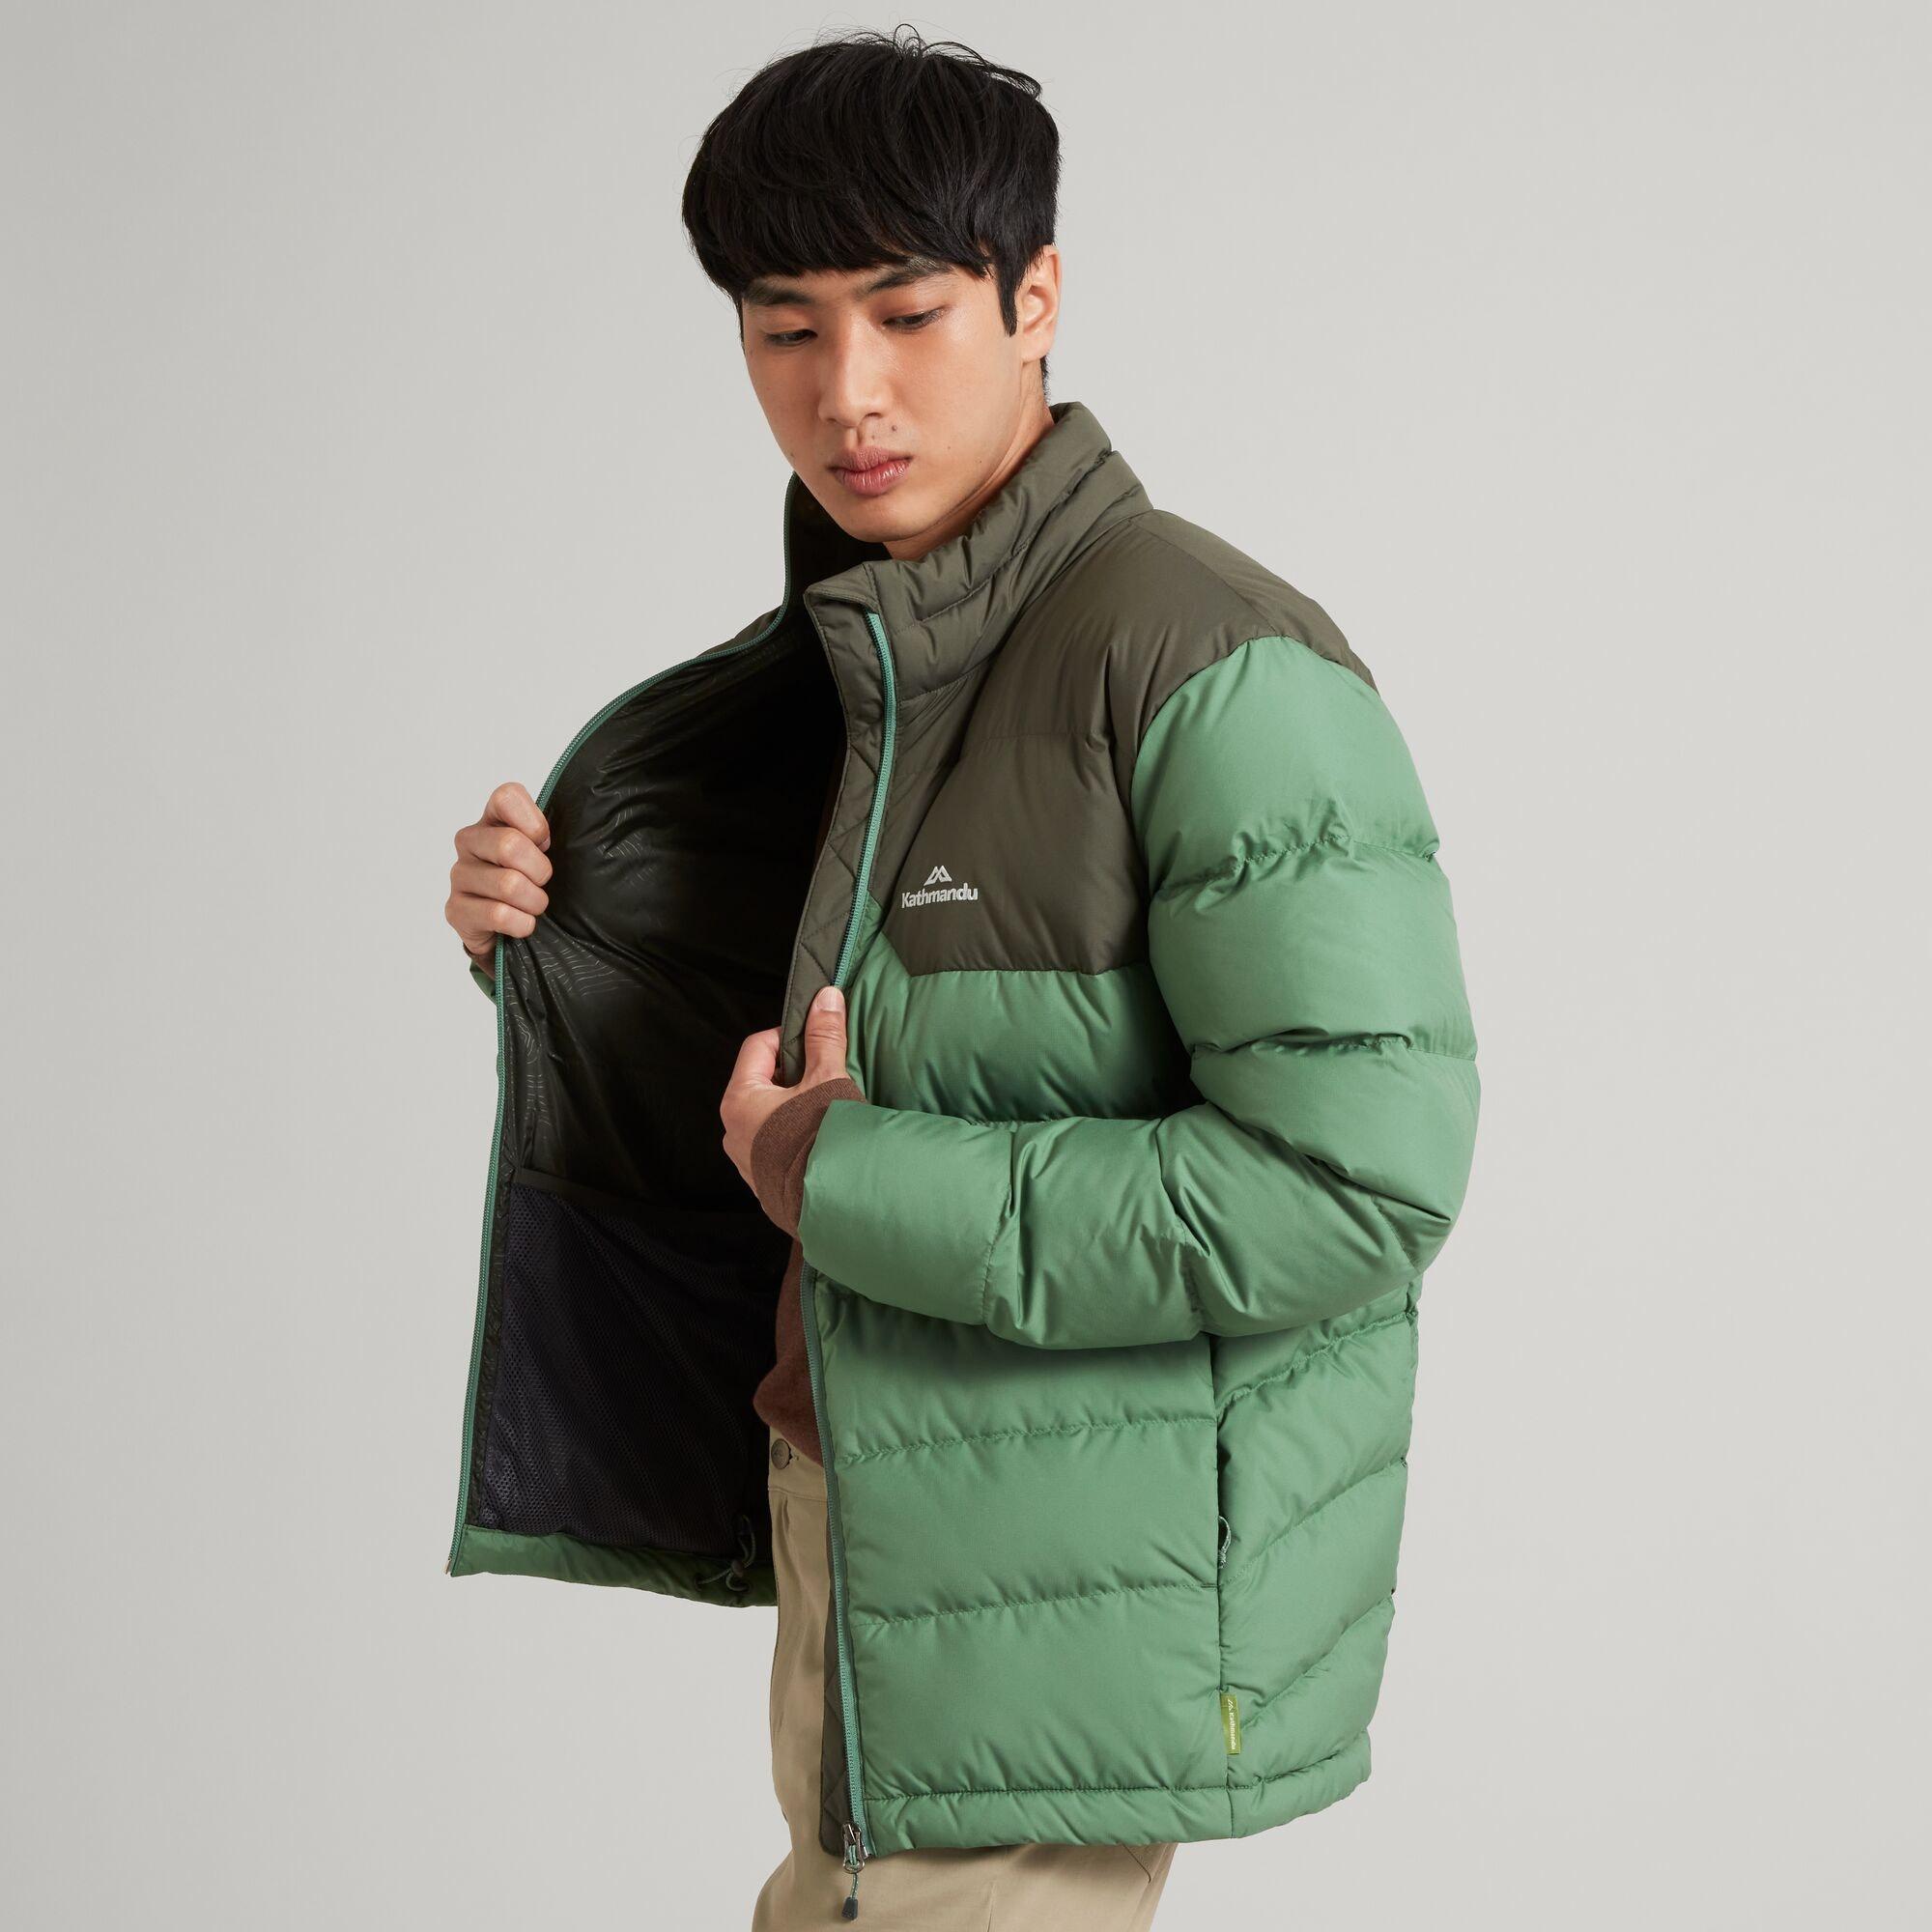 thumbnail 34 - NEW Kathmandu Epiq Mens 600 Fill Down Puffer Warm Outdoor Winter Jacket